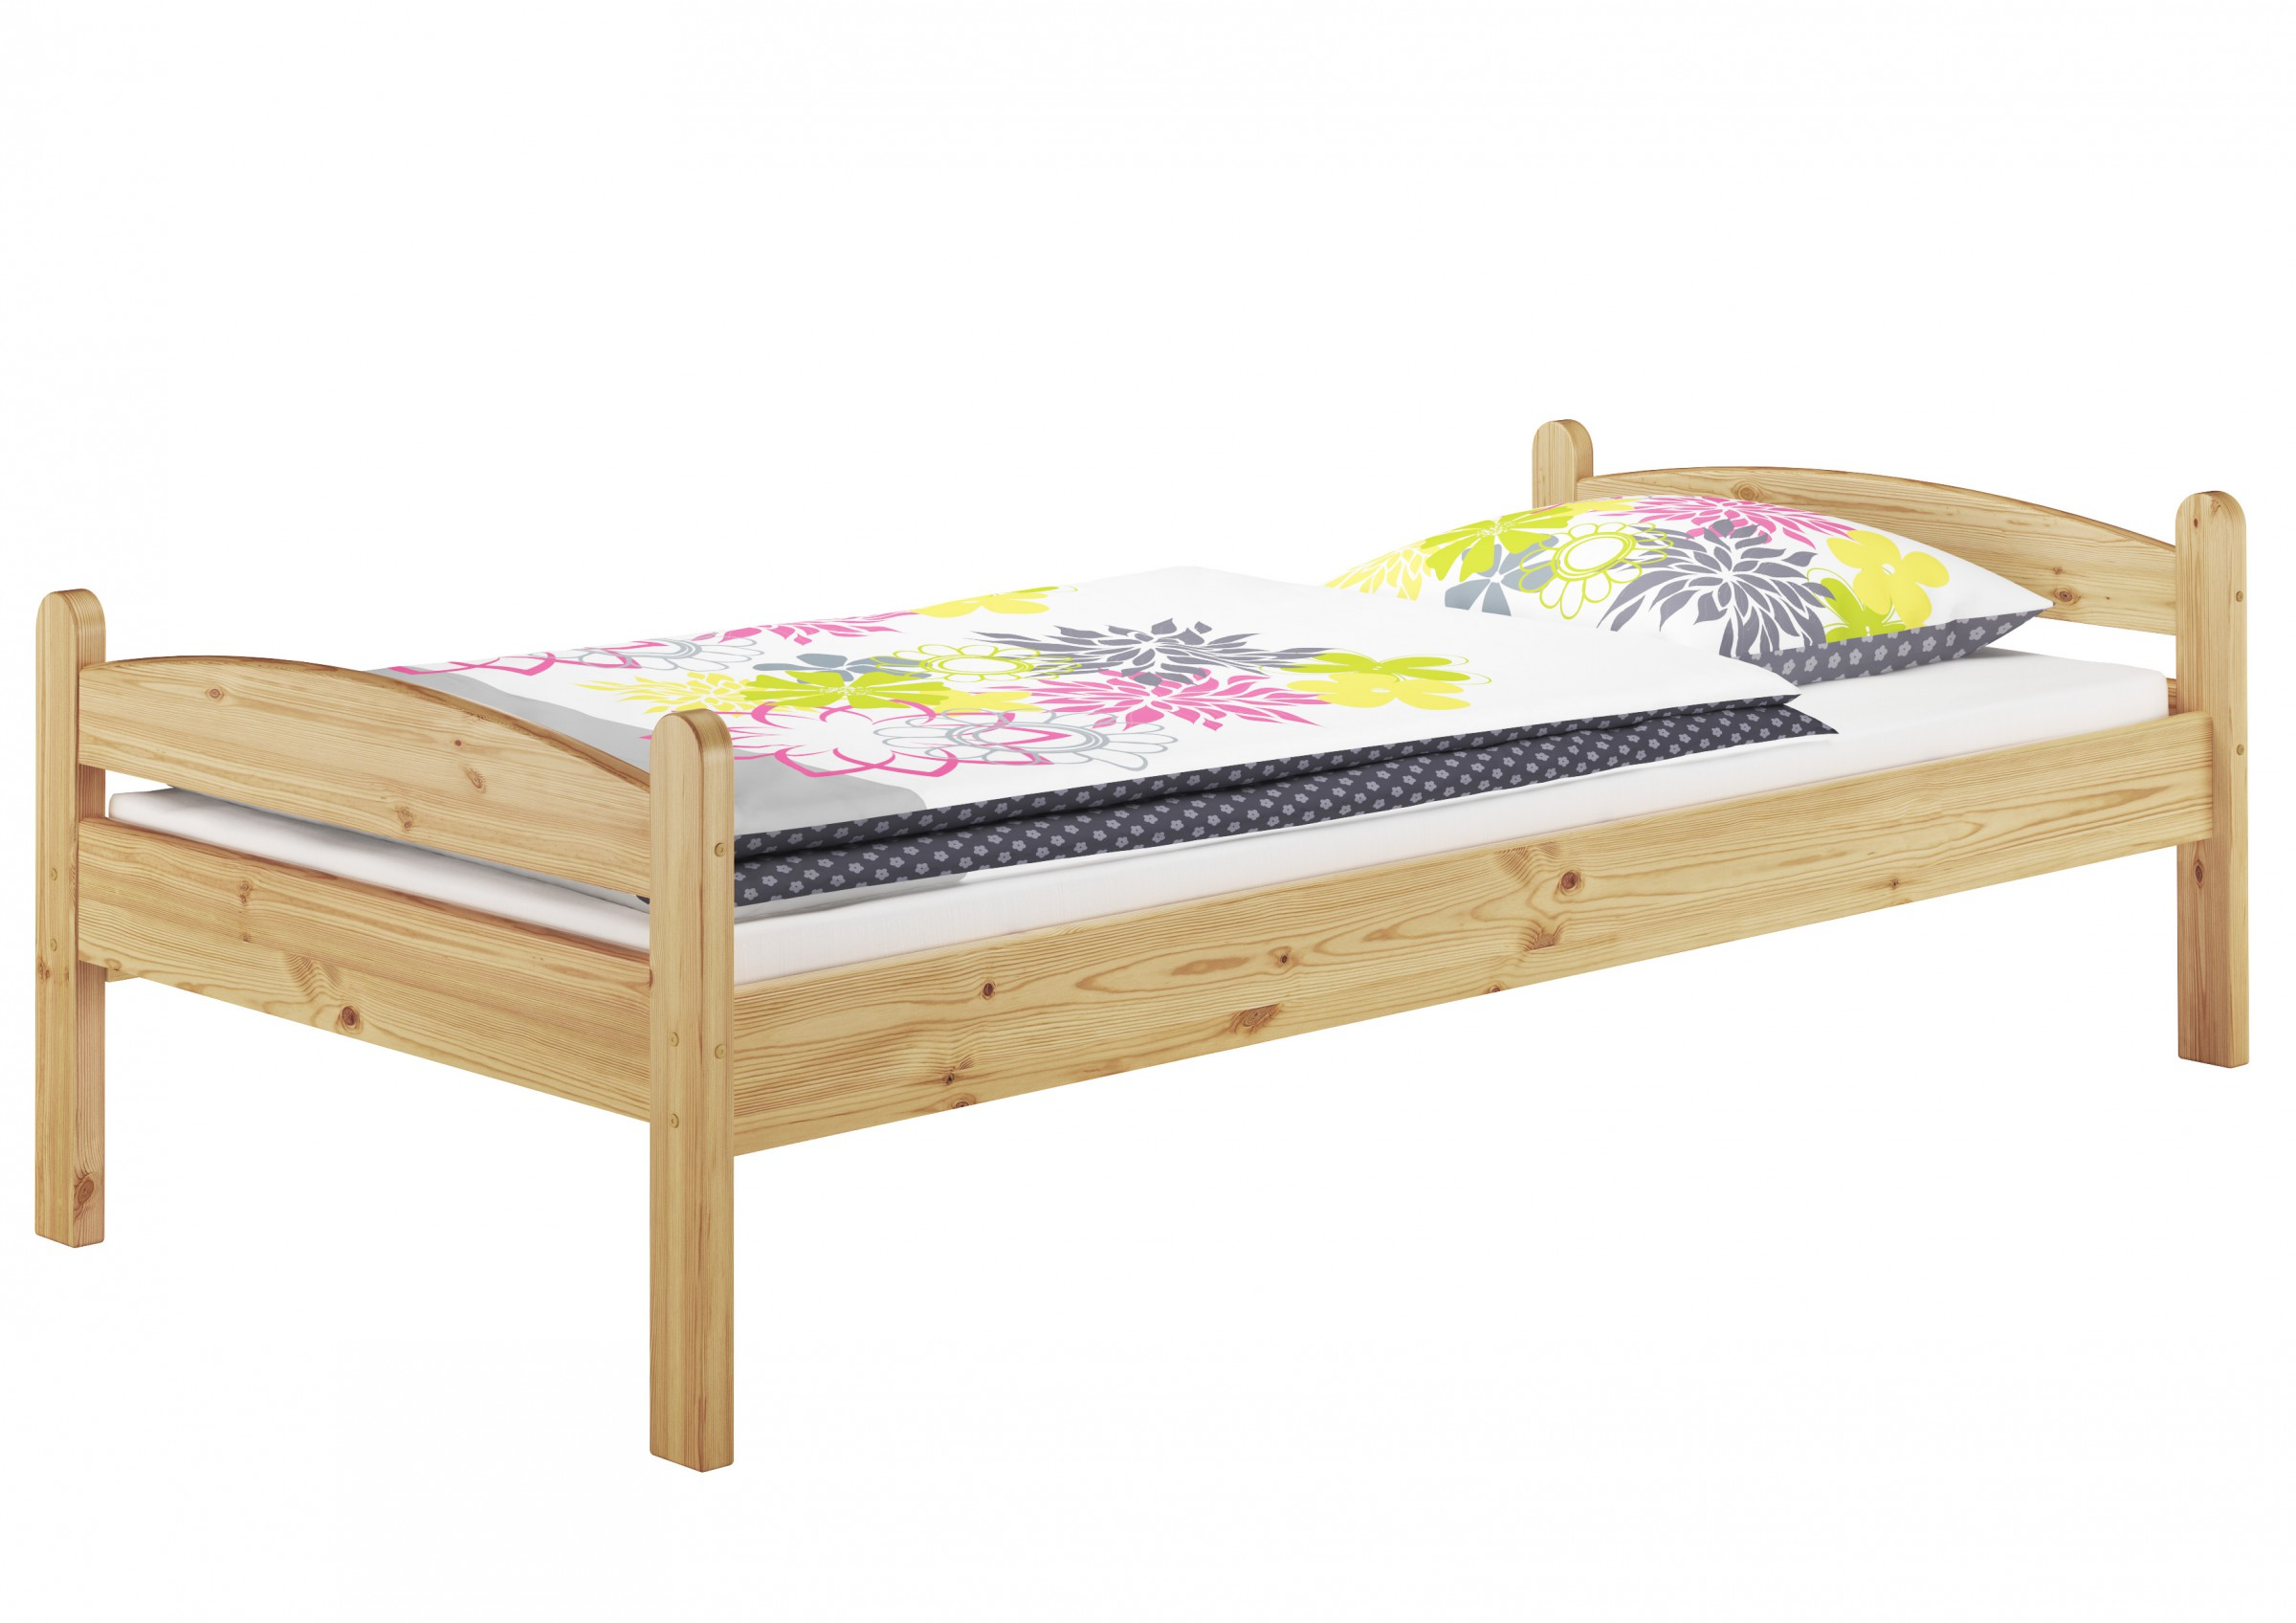 bett kiefer massiv stabil jugendbett g ste 90x200 rollrost matratze m 4250639512221 ebay. Black Bedroom Furniture Sets. Home Design Ideas